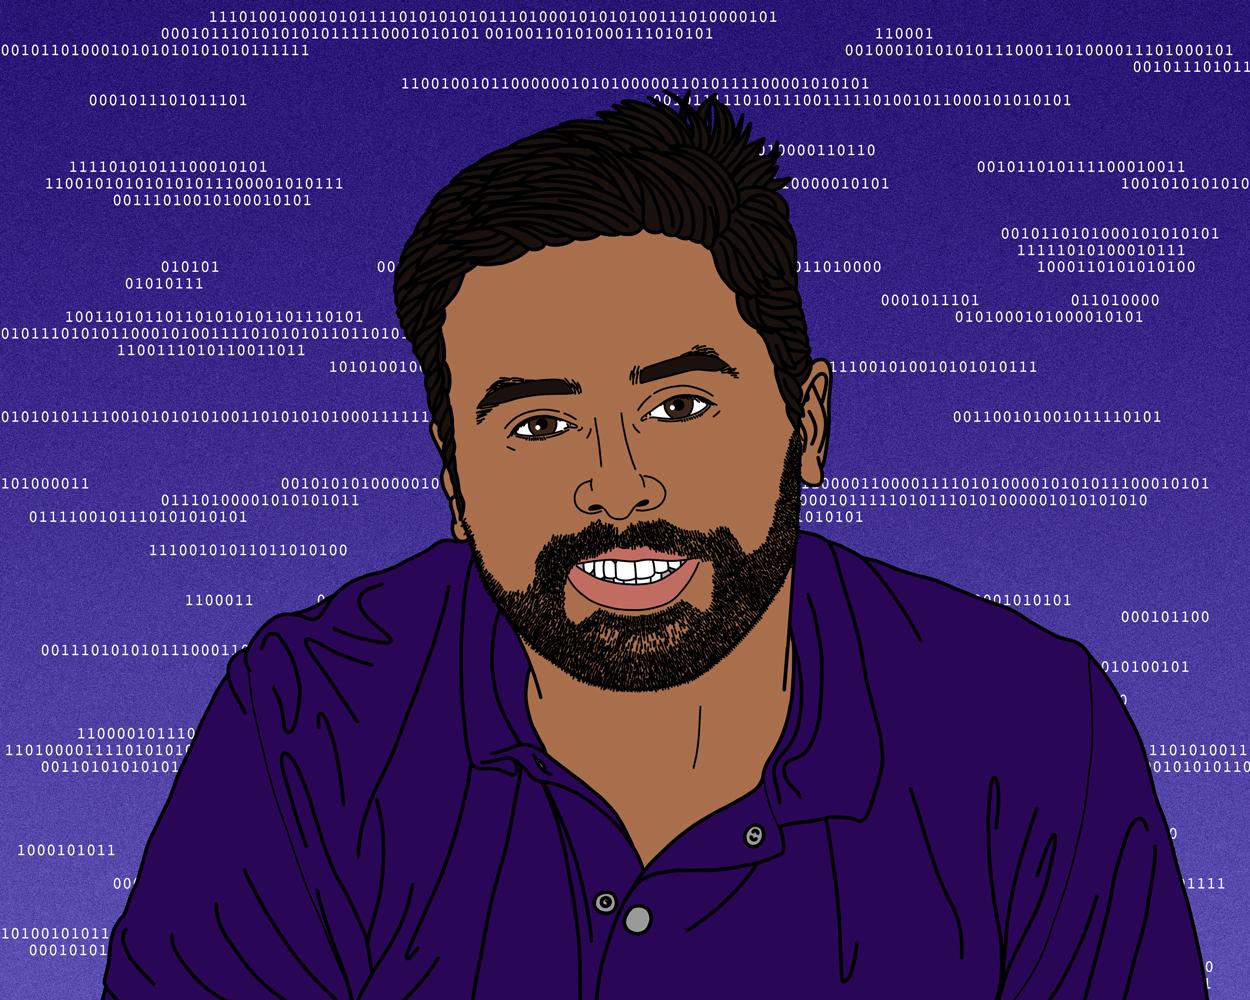 Aniruddh Jain, Founder & CEO of Blockseed